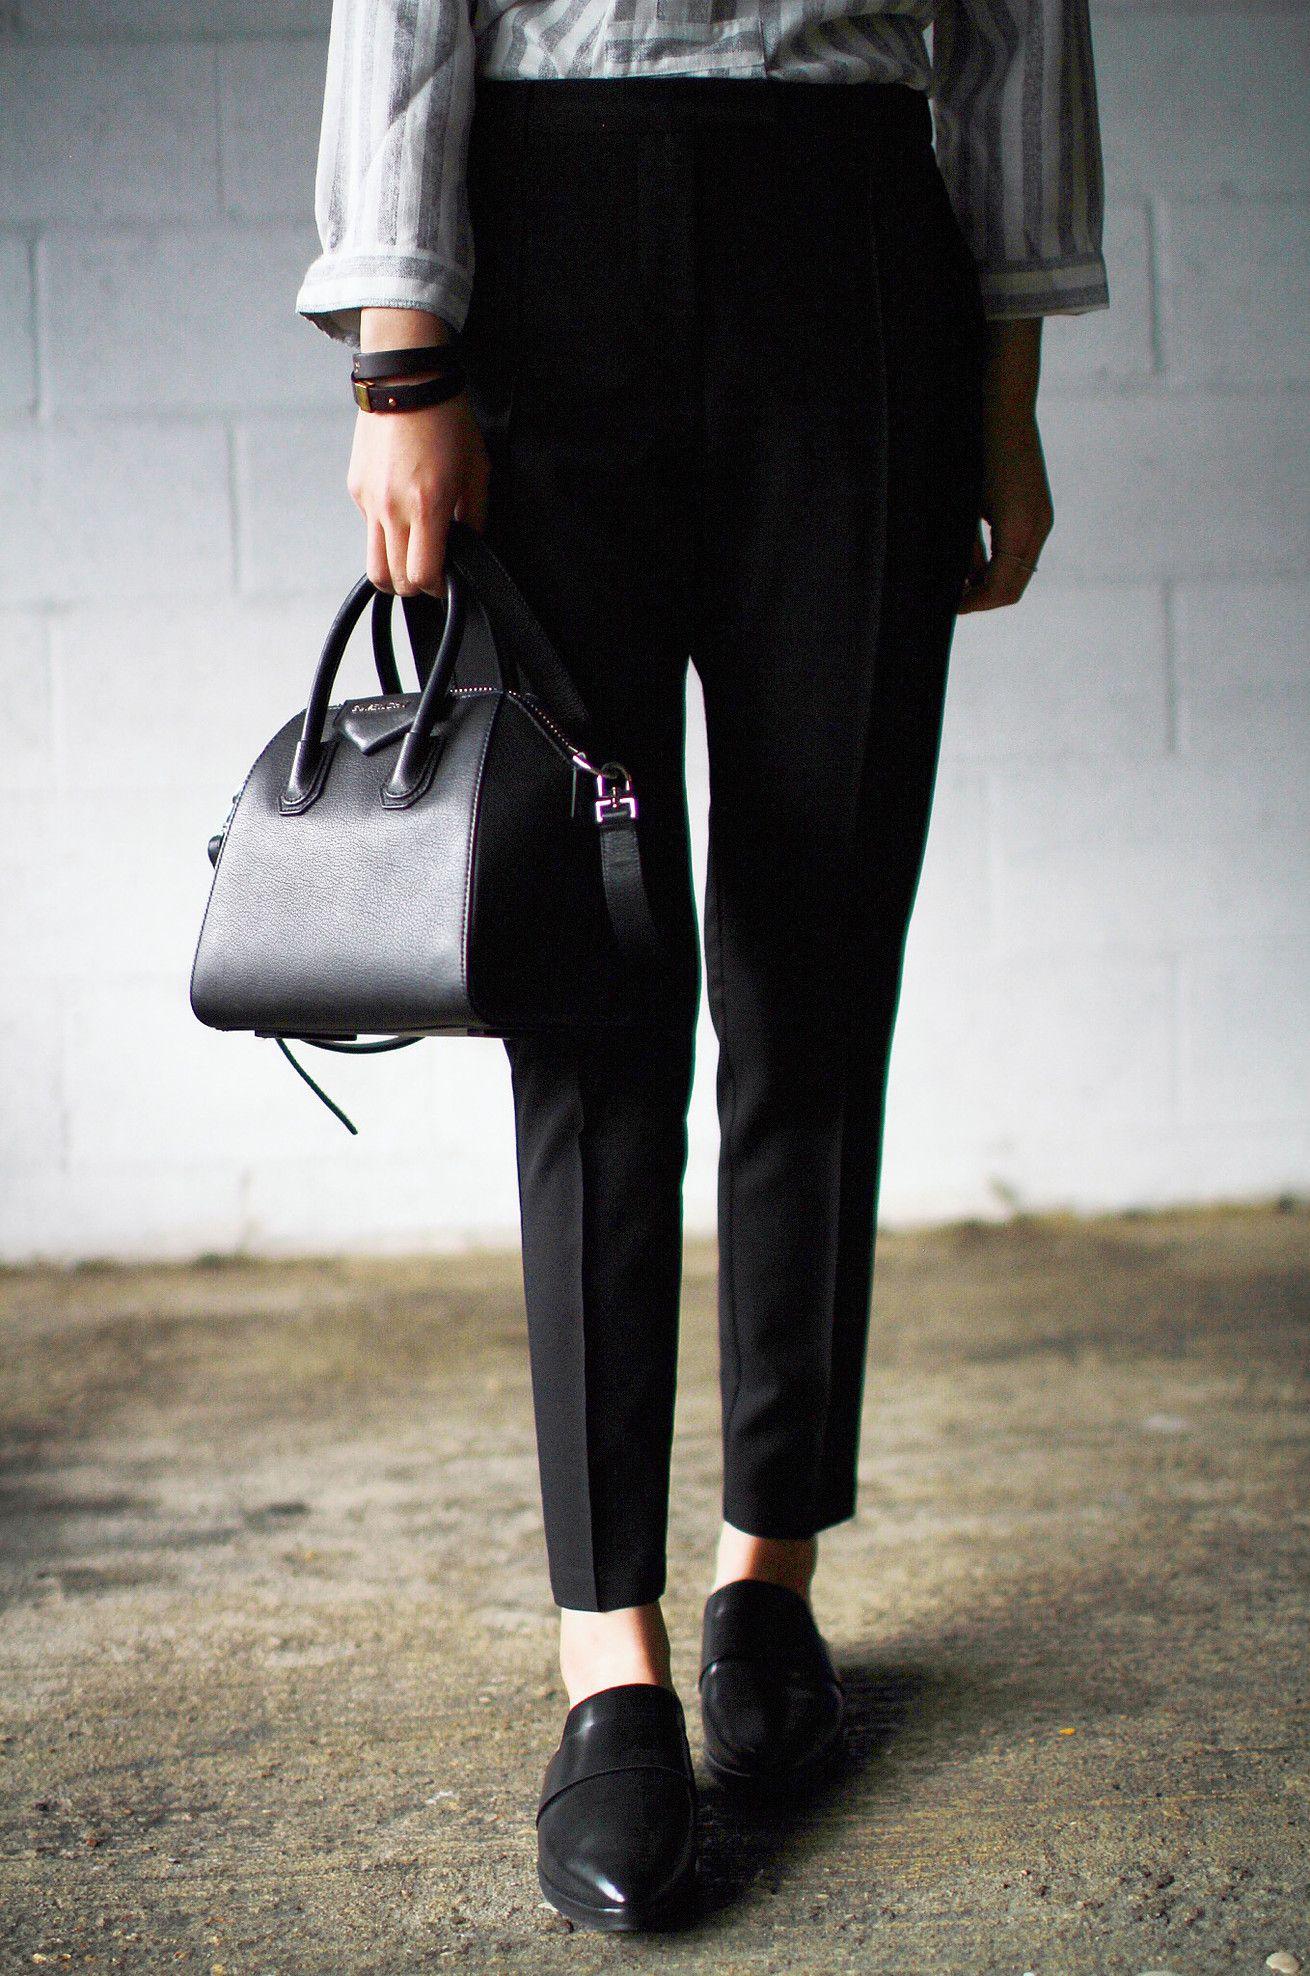 bde21559c1fa Top - Just Female Trousers - Topshop Shoes - Mango Bag - Givenchy Mini  Antigona Bracelet - Celine